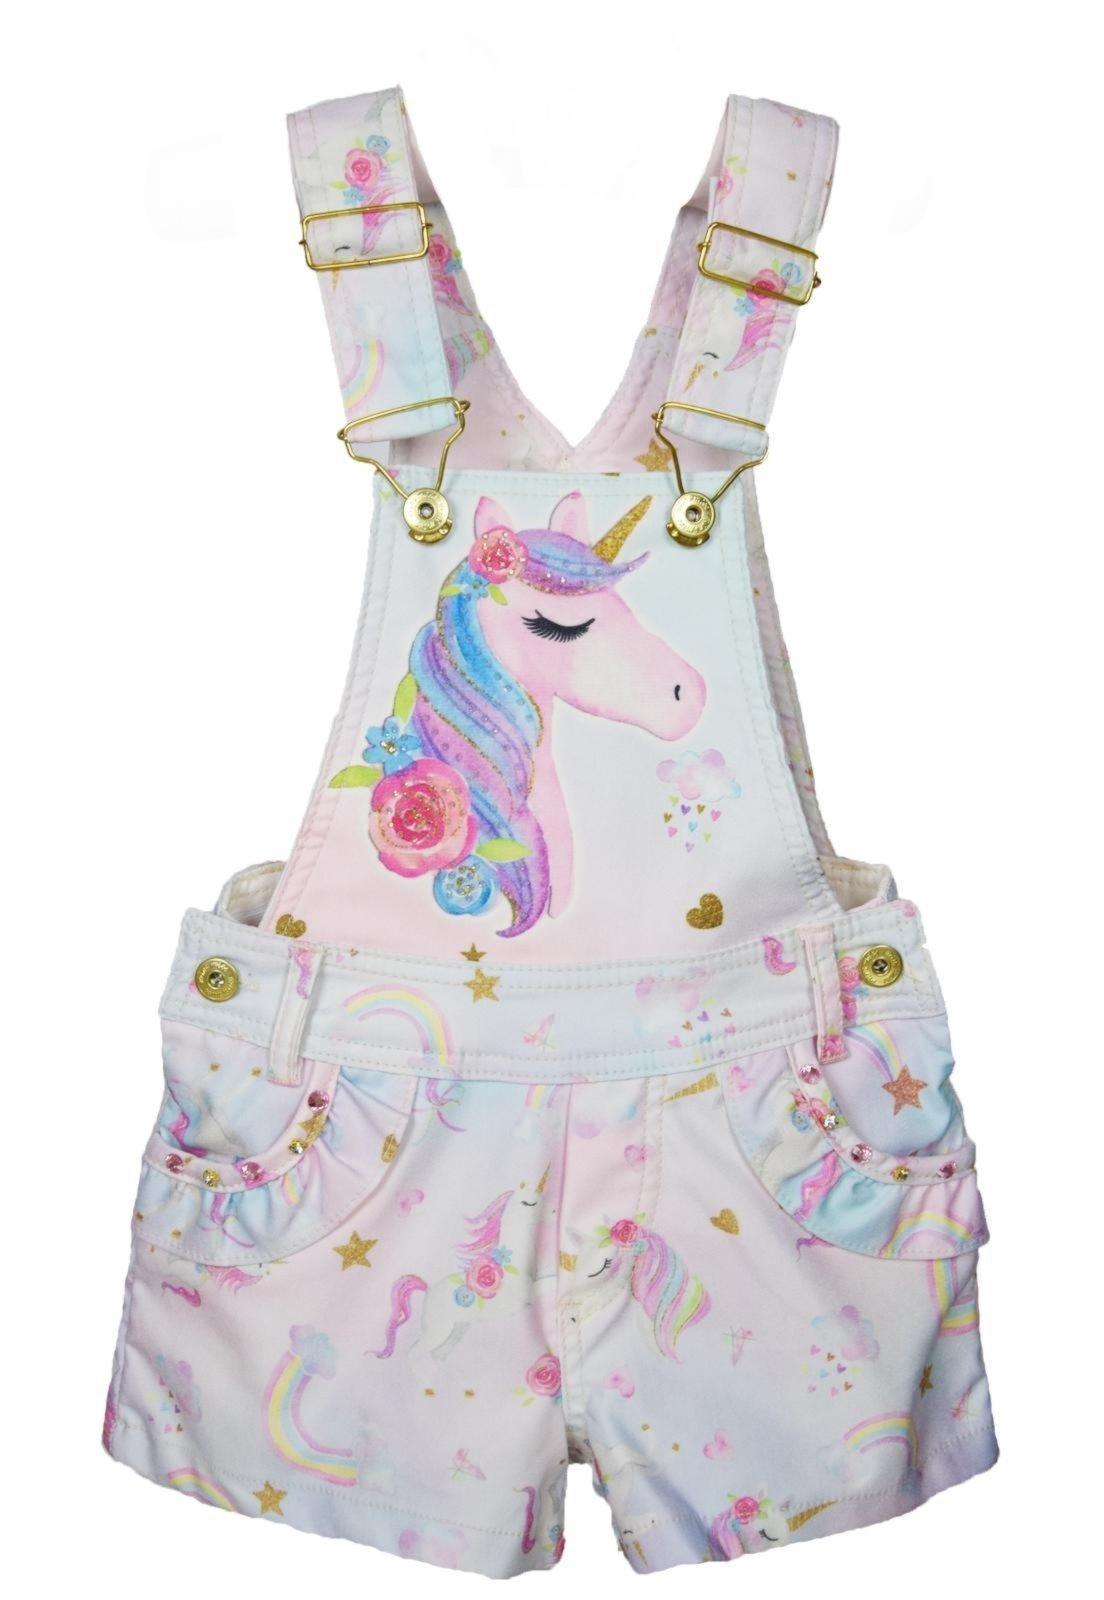 Jardineira Infantil Mini Miss Unicornio Rosa Compre Agora Dafiti Brasil